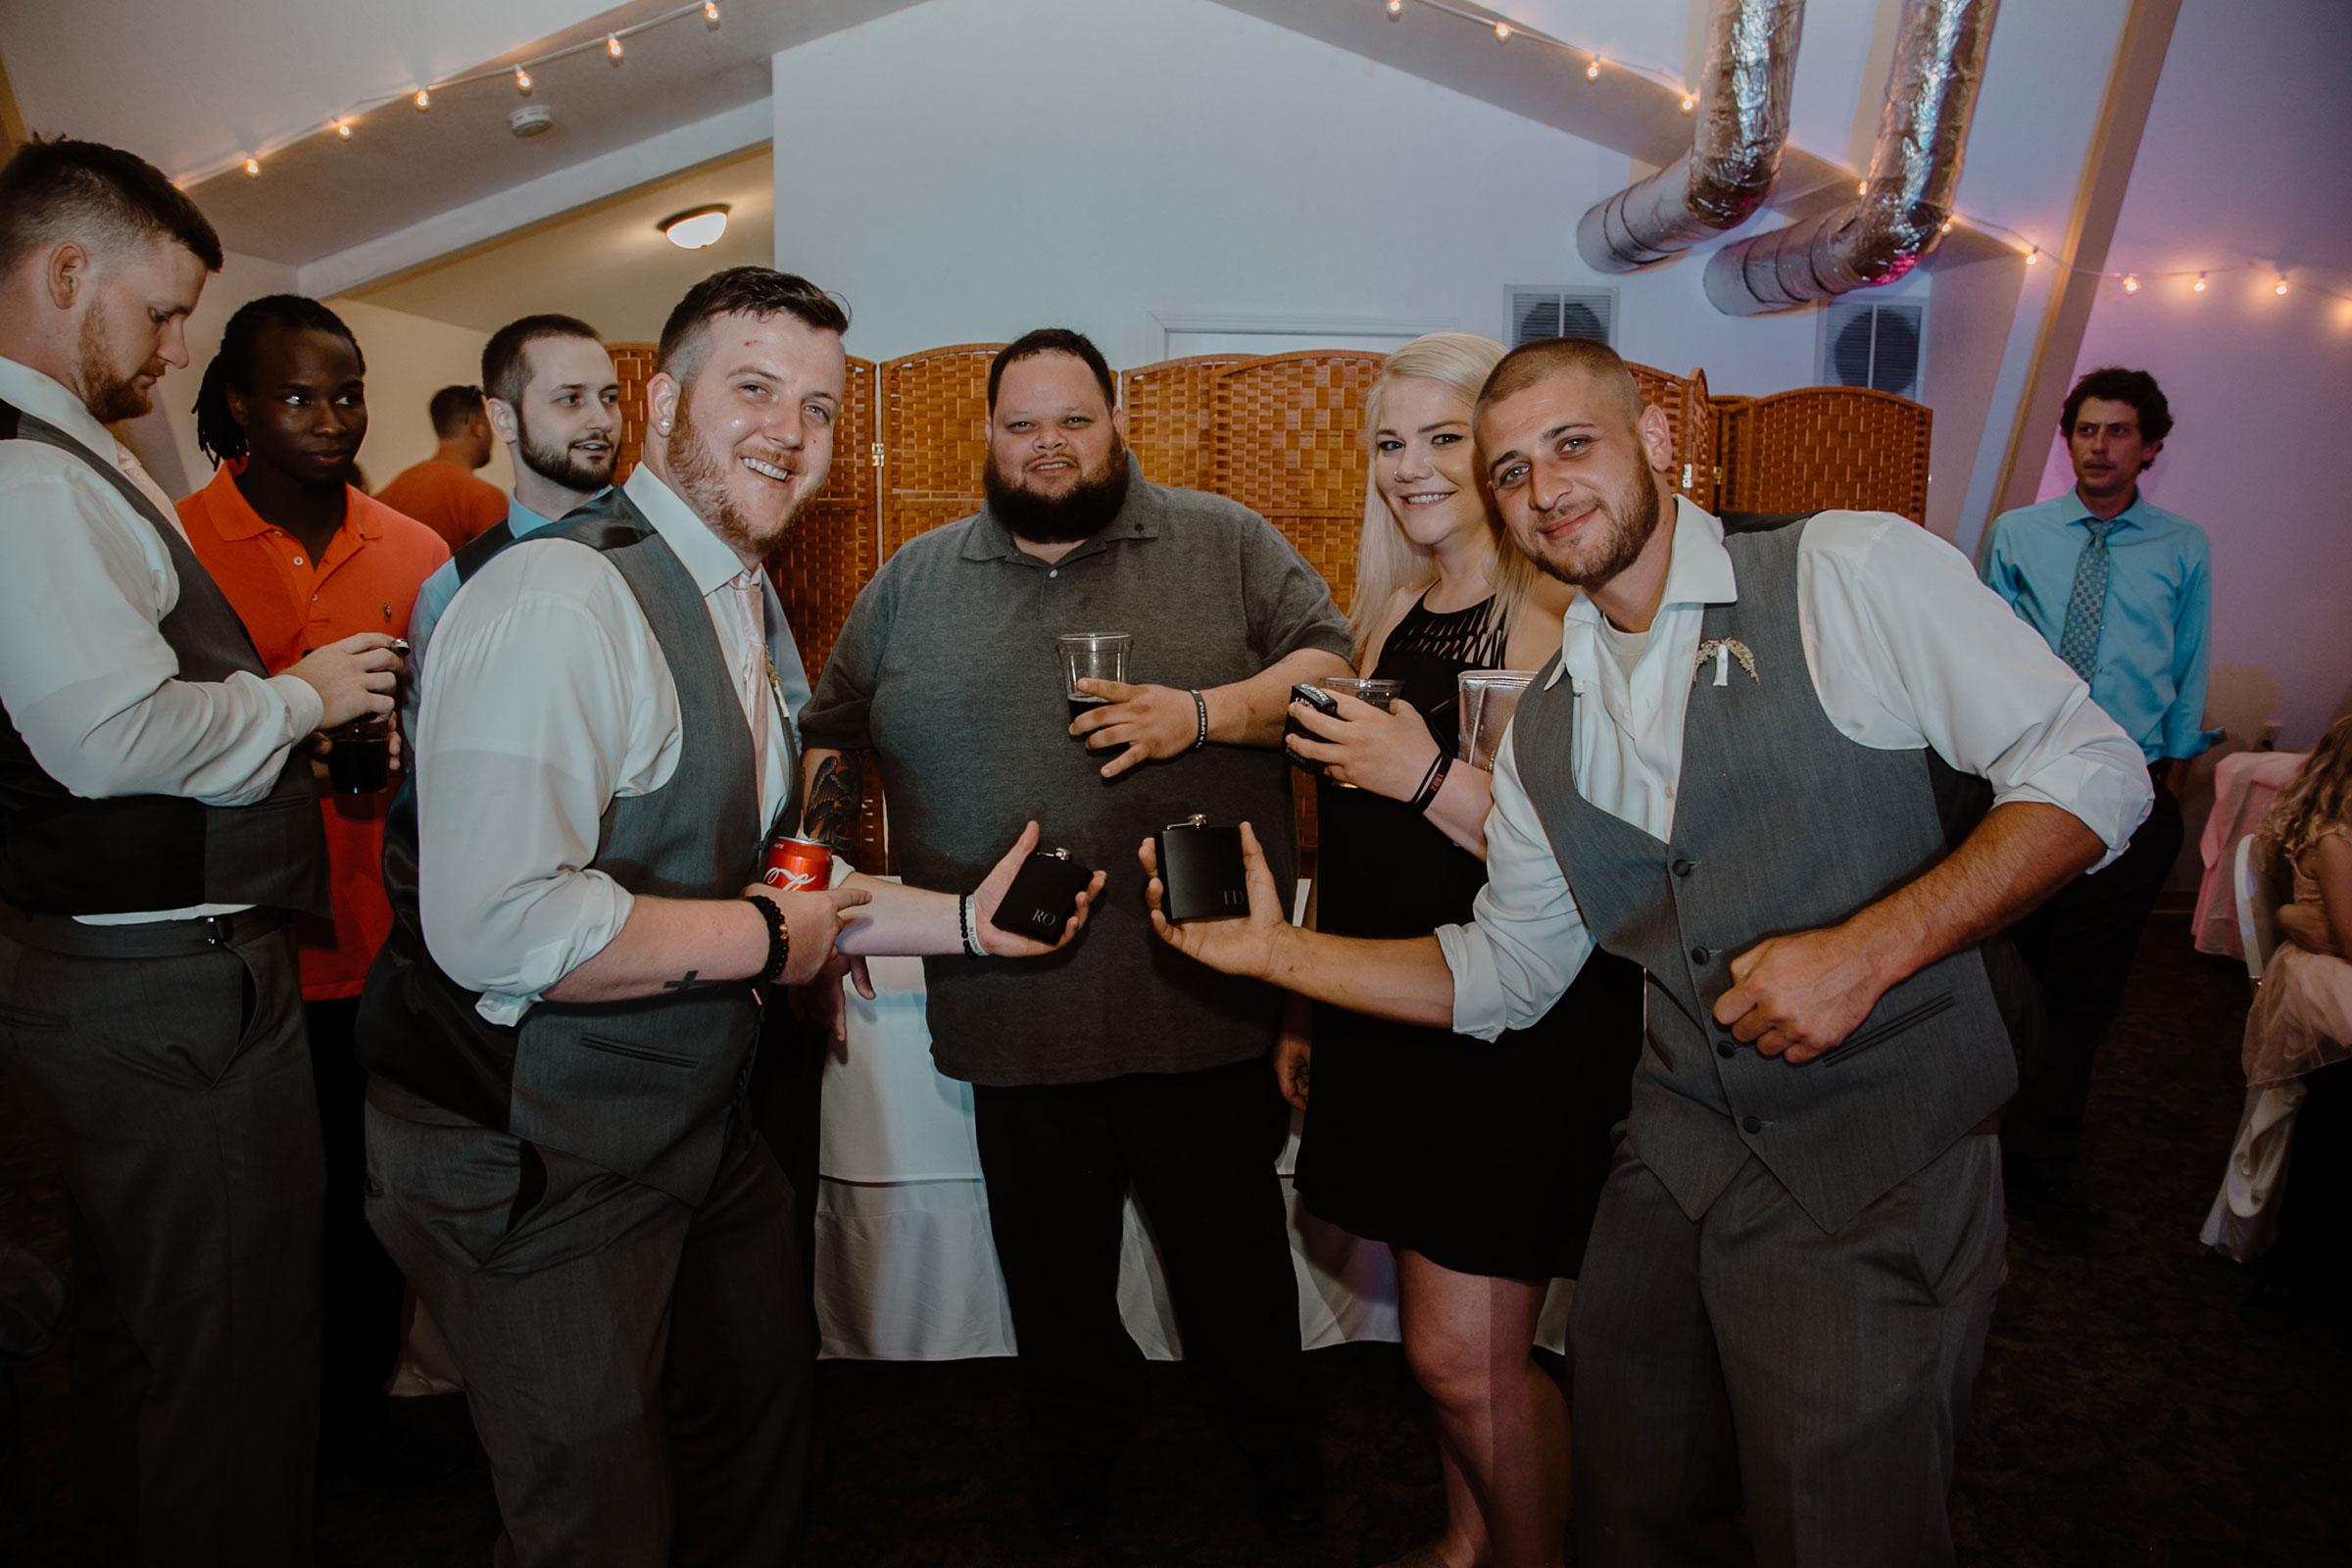 groomsmen-posing-with-flasks-wedding-summerset-winery-indianola-iowa-raelyn-ramey-photography.jpg